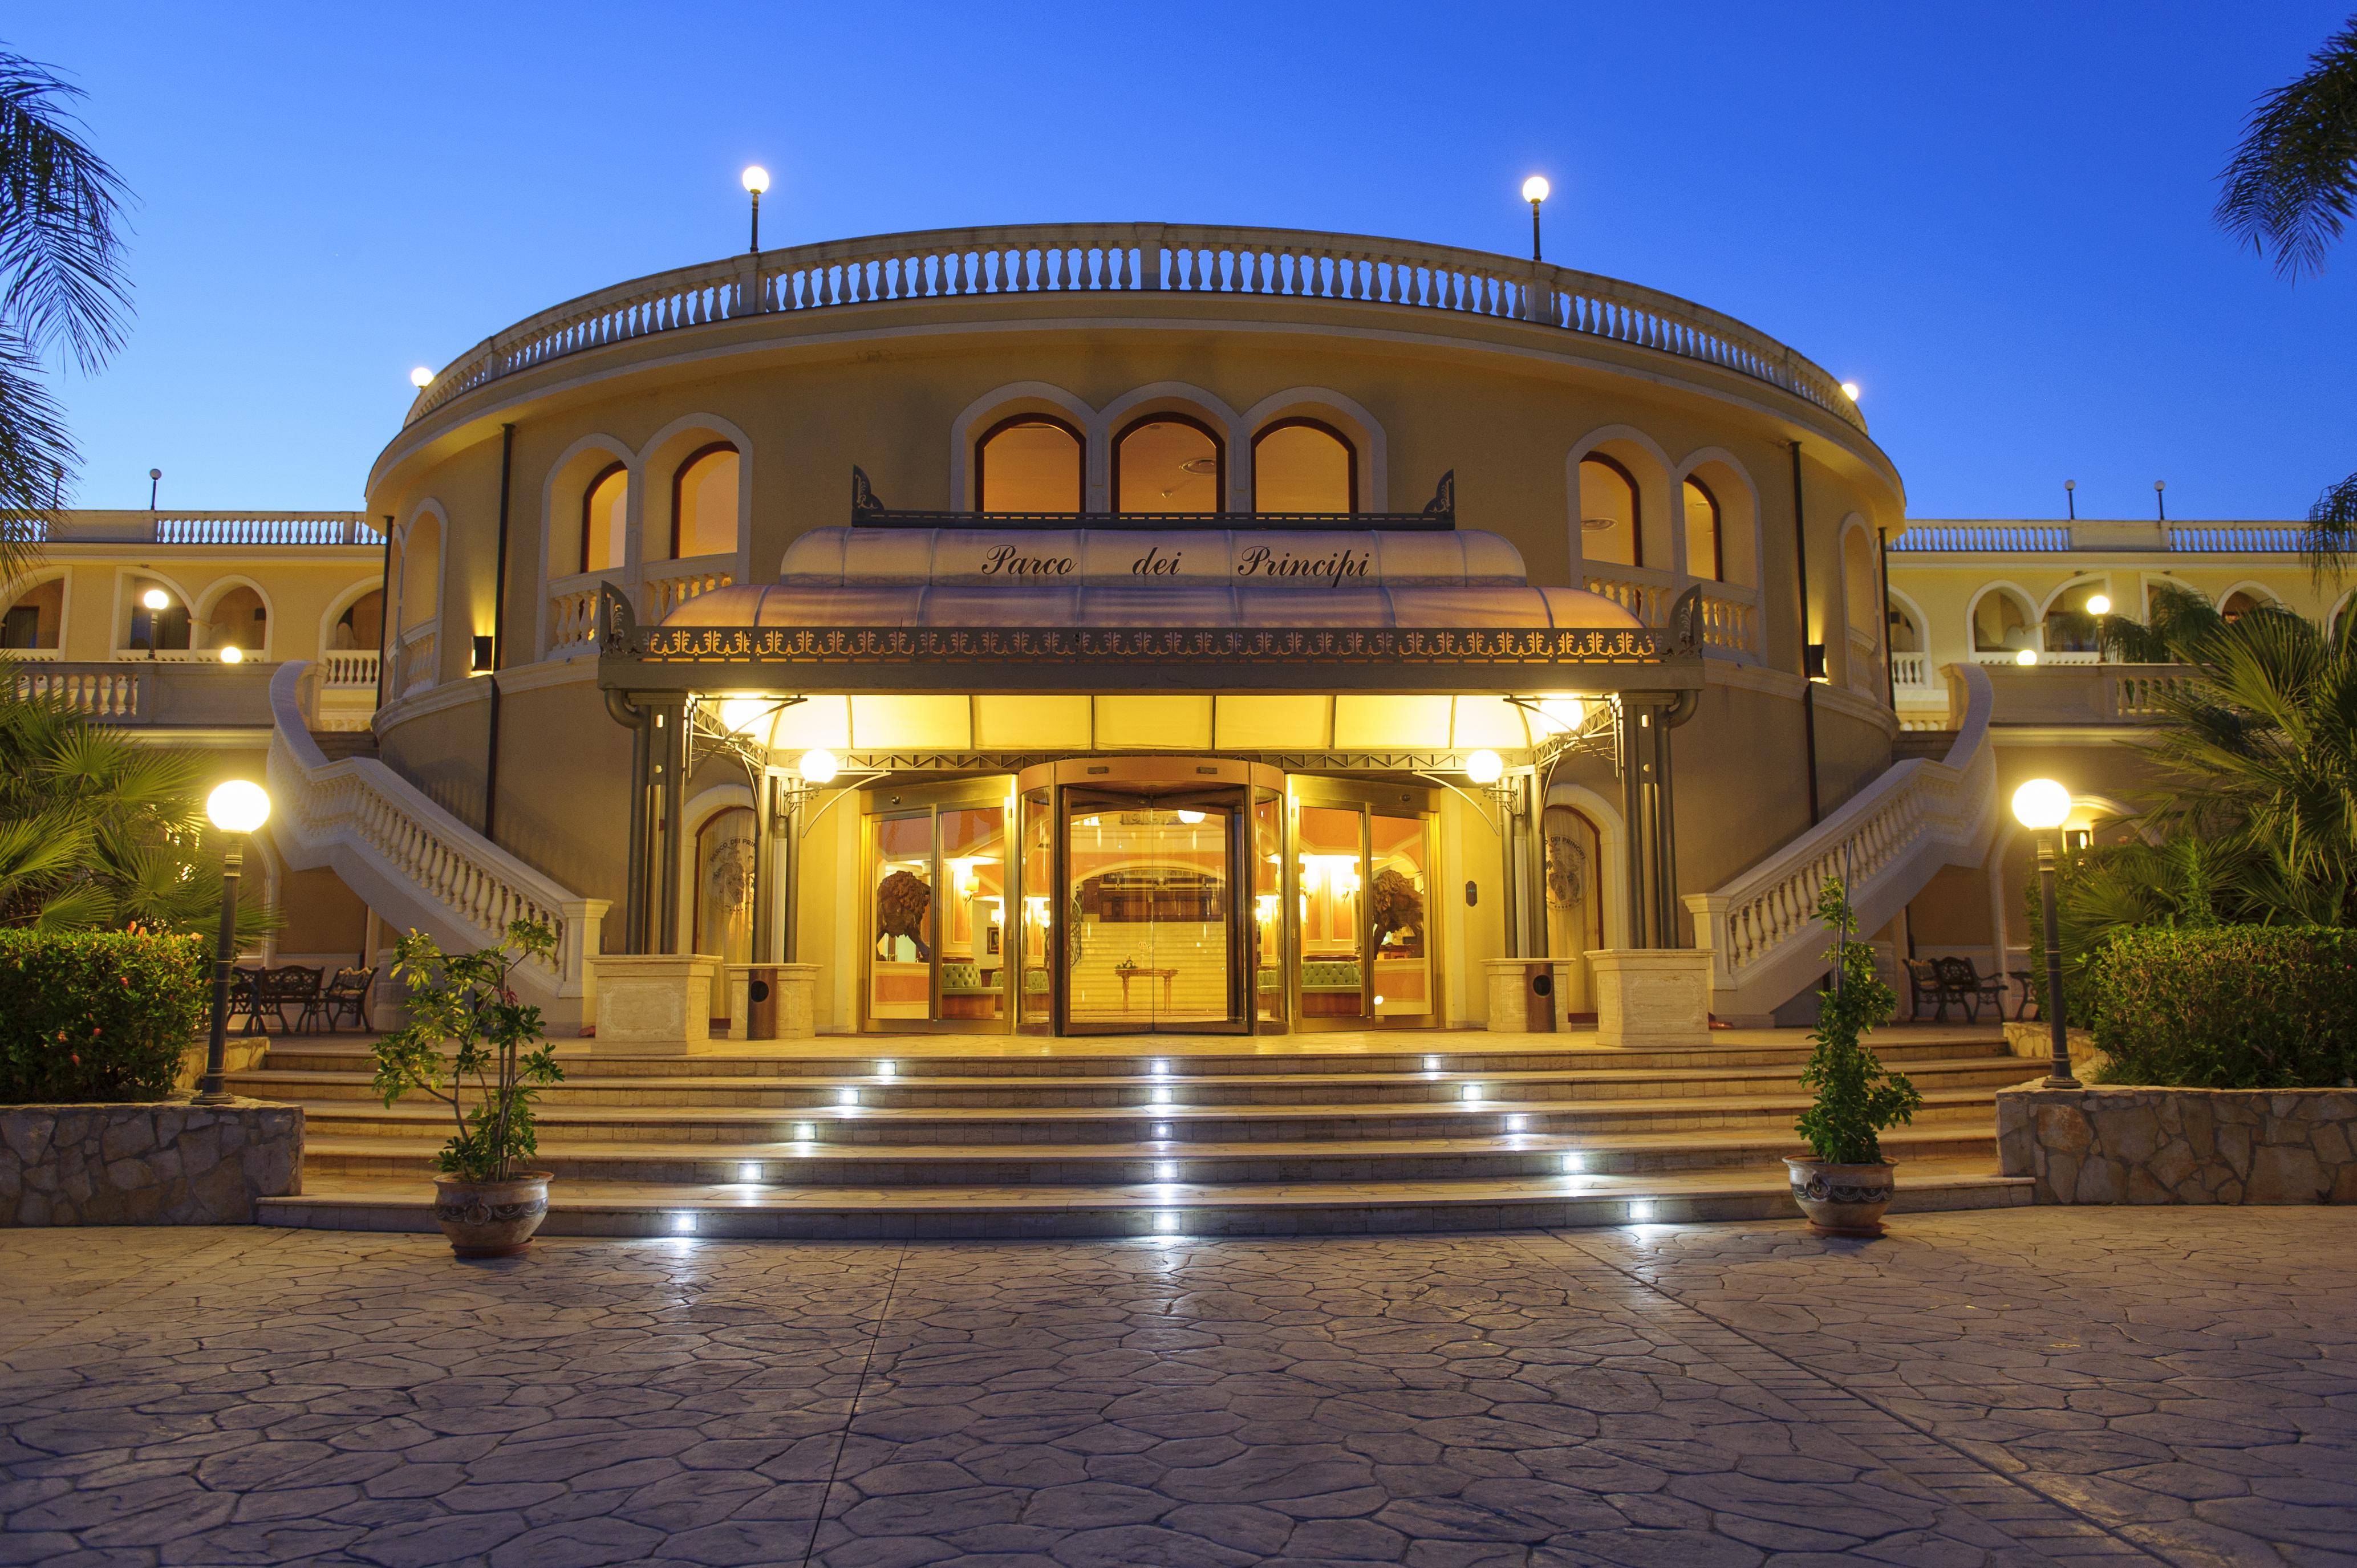 Hotel Resort Parco dei Principi